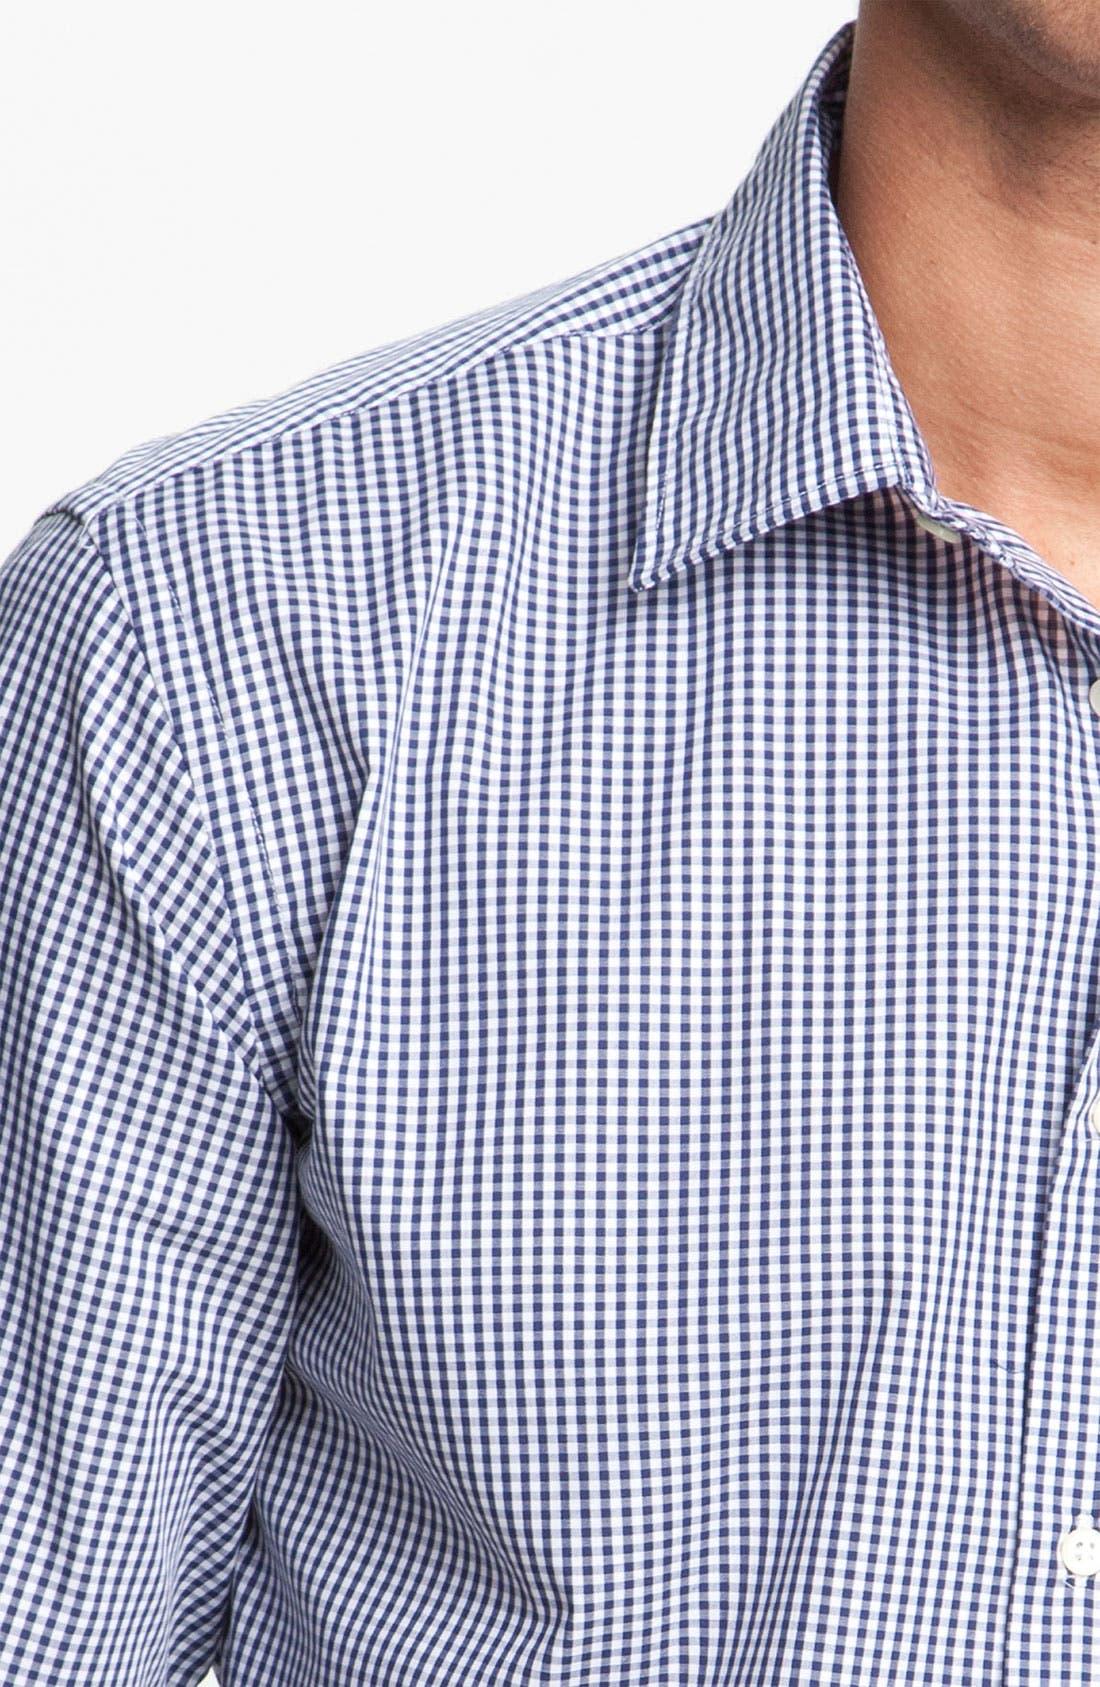 Alternate Image 3  - Mason's Micro Gingham Cotton Shirt